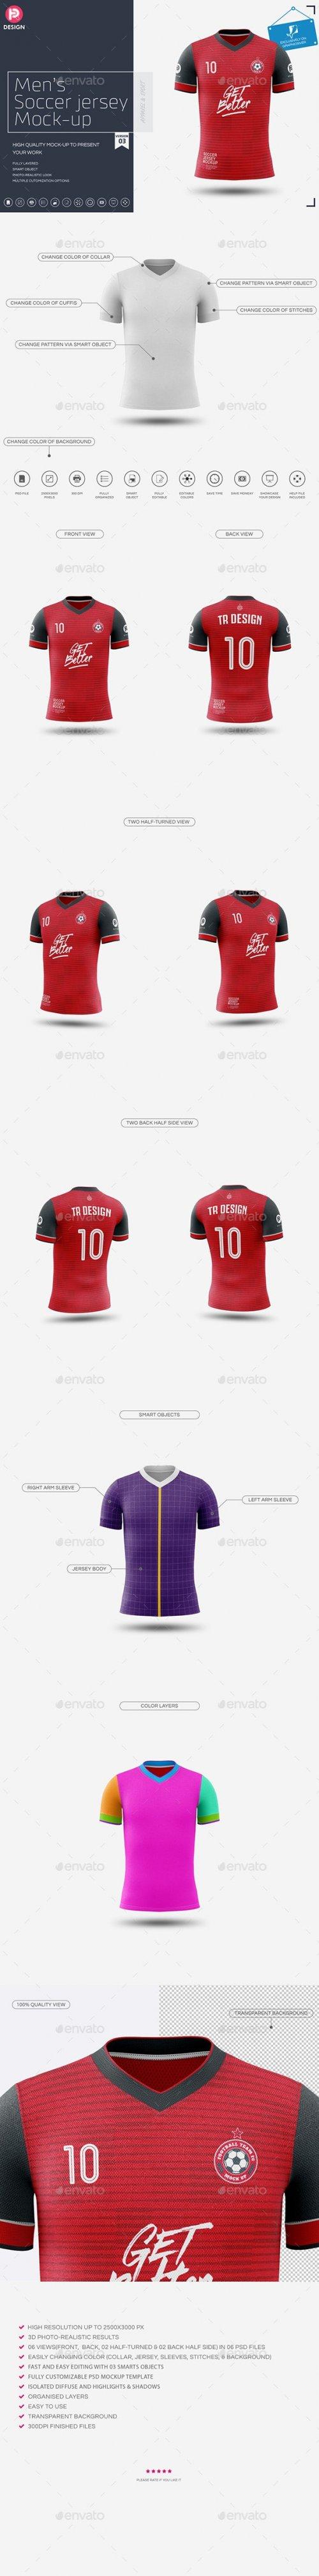 GraphicRiver - Men's Soccer Jersey Mockup V3 24206939